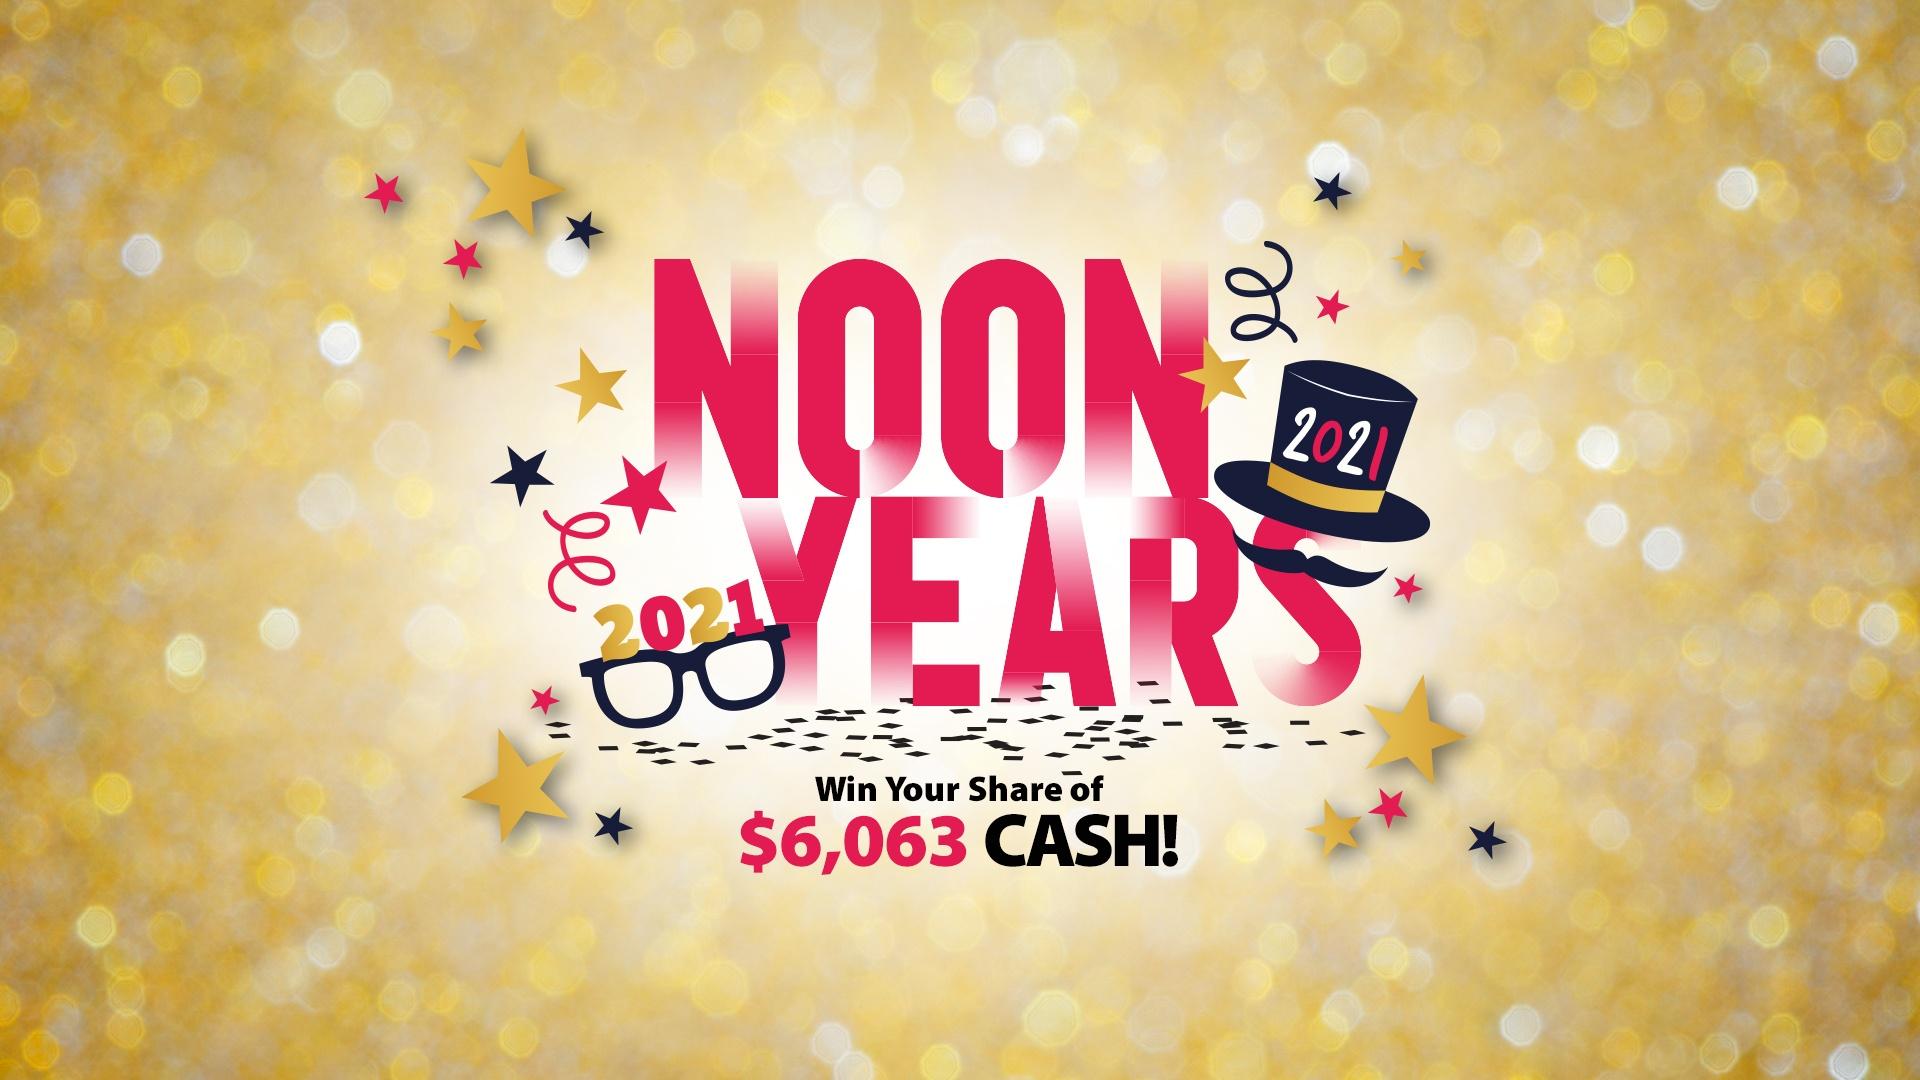 Noon Years Clearwater Casino Resort